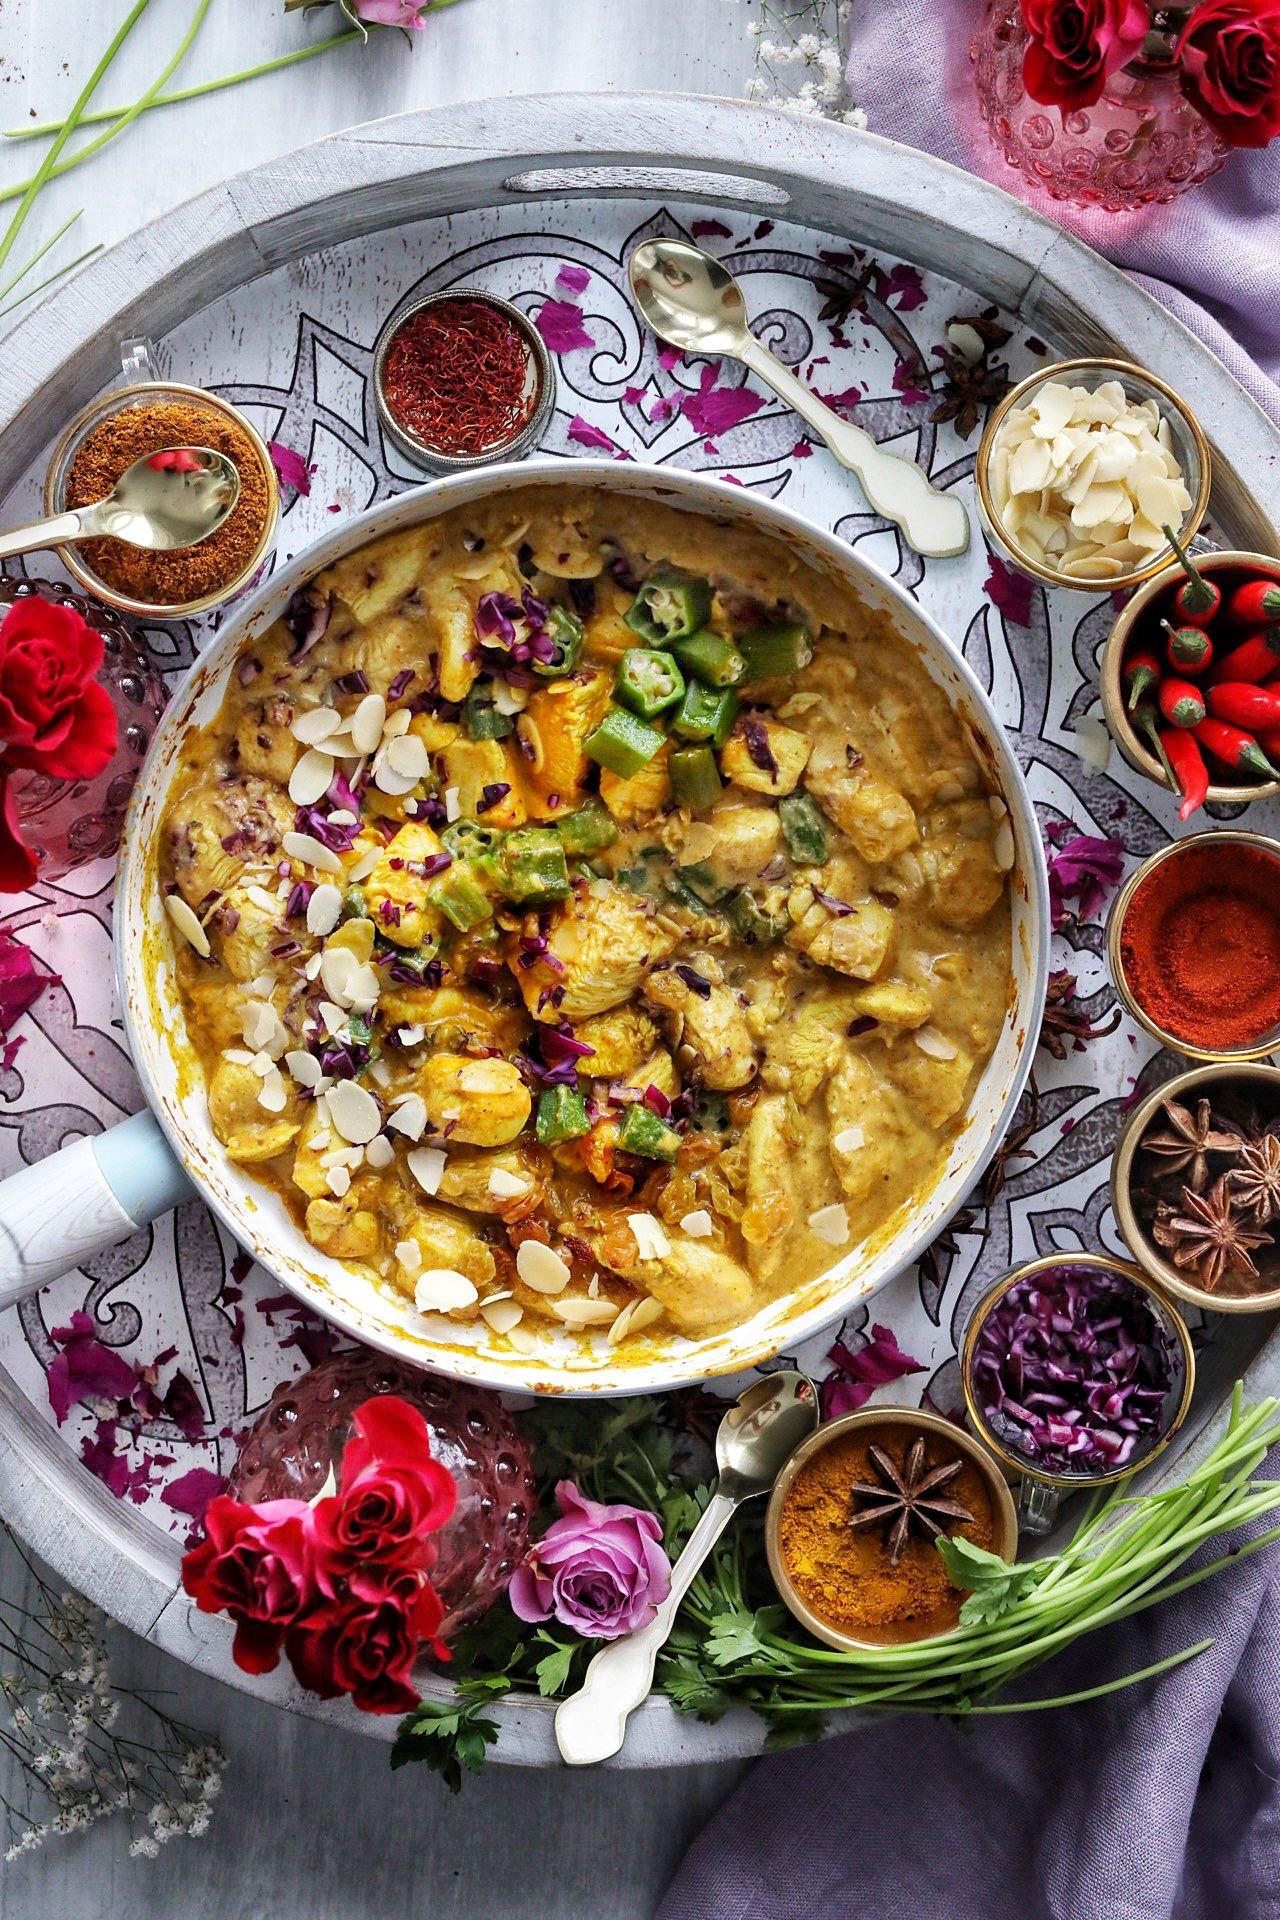 Patak S 3 Step Chicken Korma Medley With Almonds Golden Raisins Recipe Chicken Korma Korma Recipe Korma